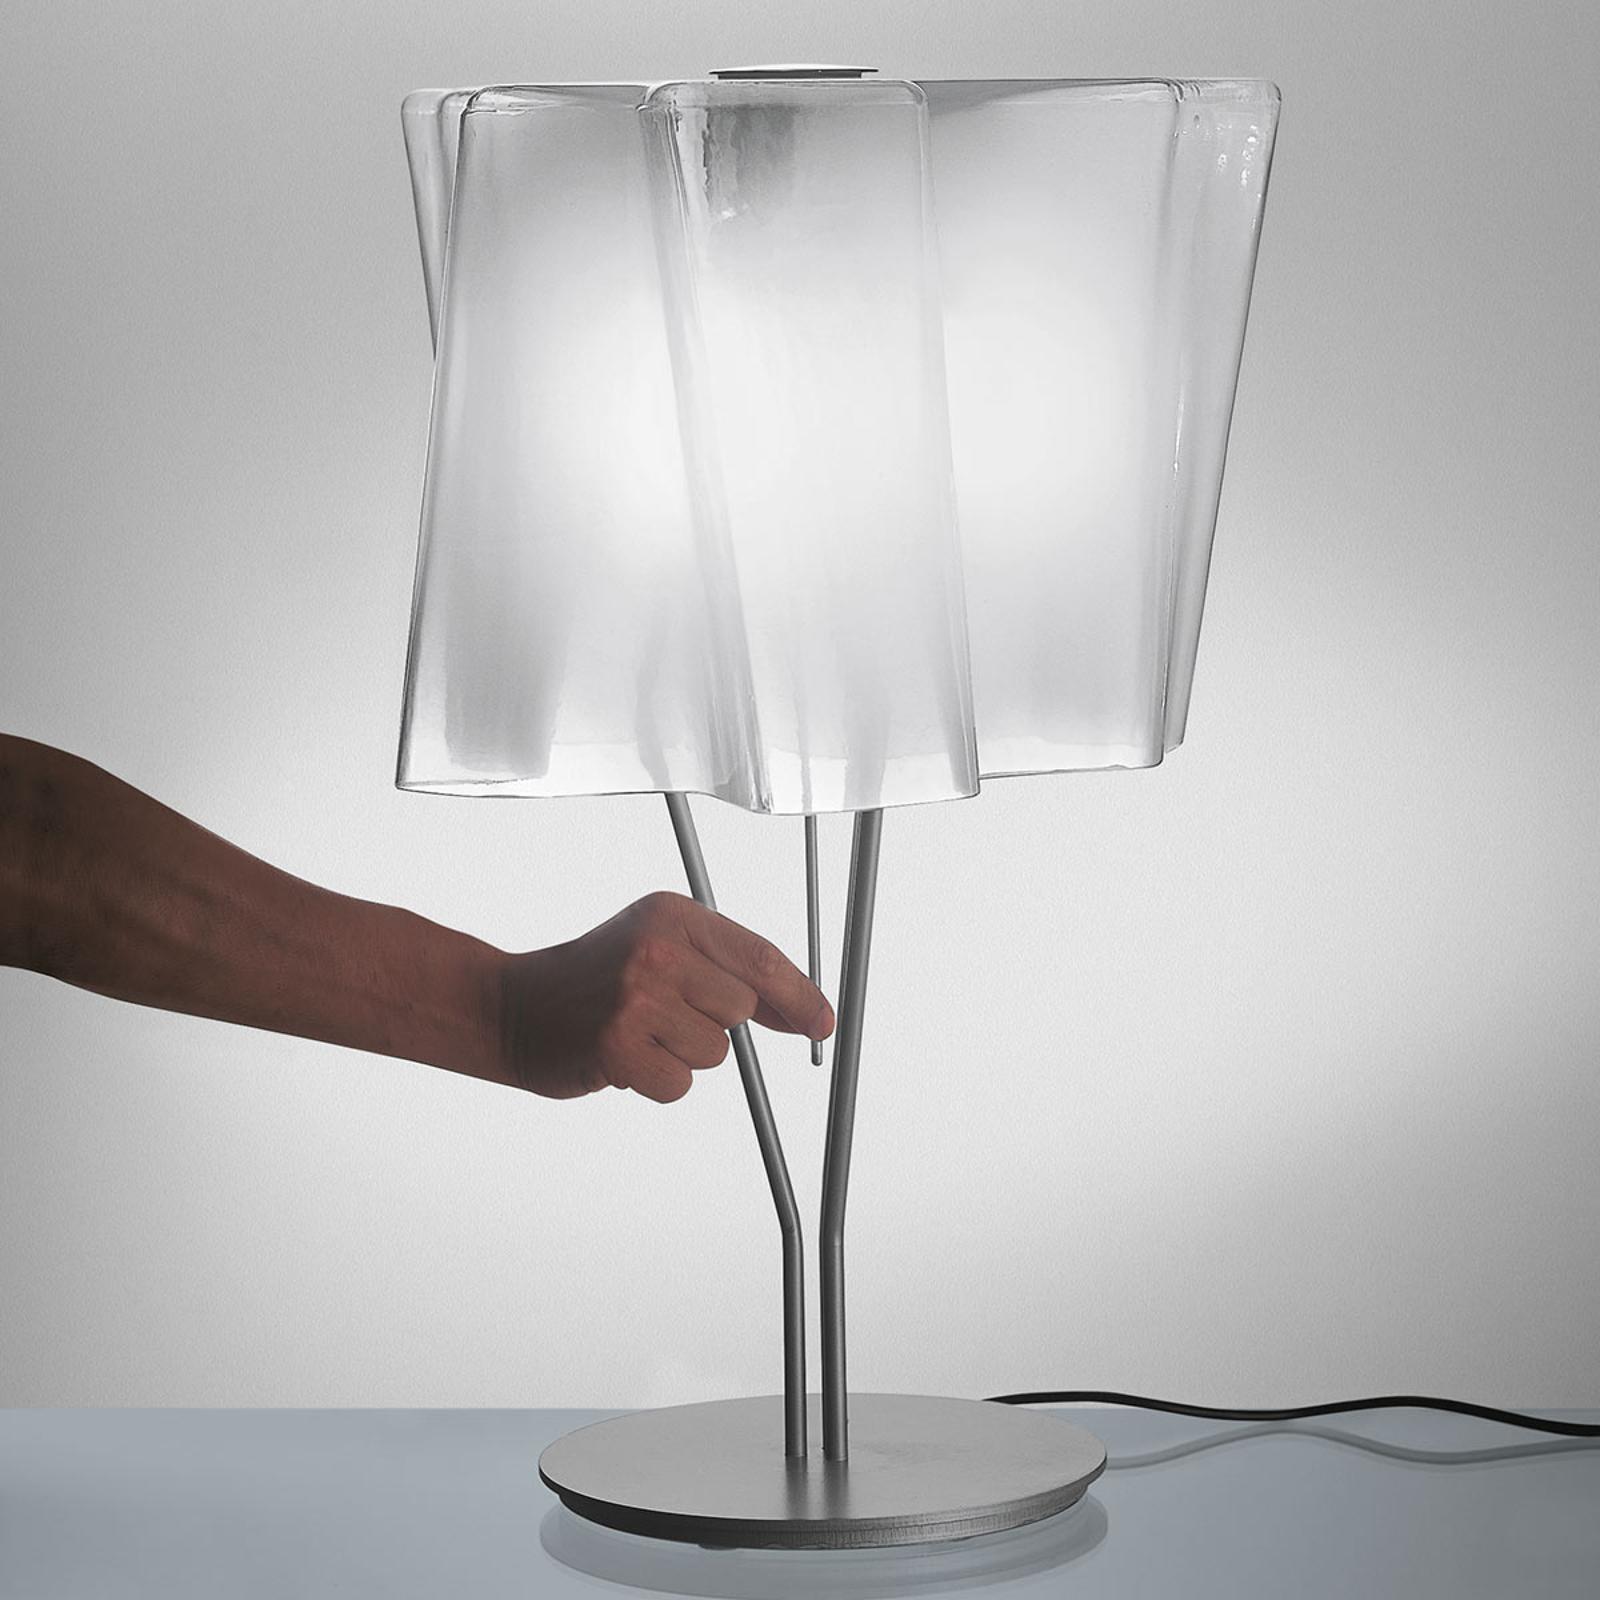 Artemide Logico tafellamp 64 cm zijdeglans/alu